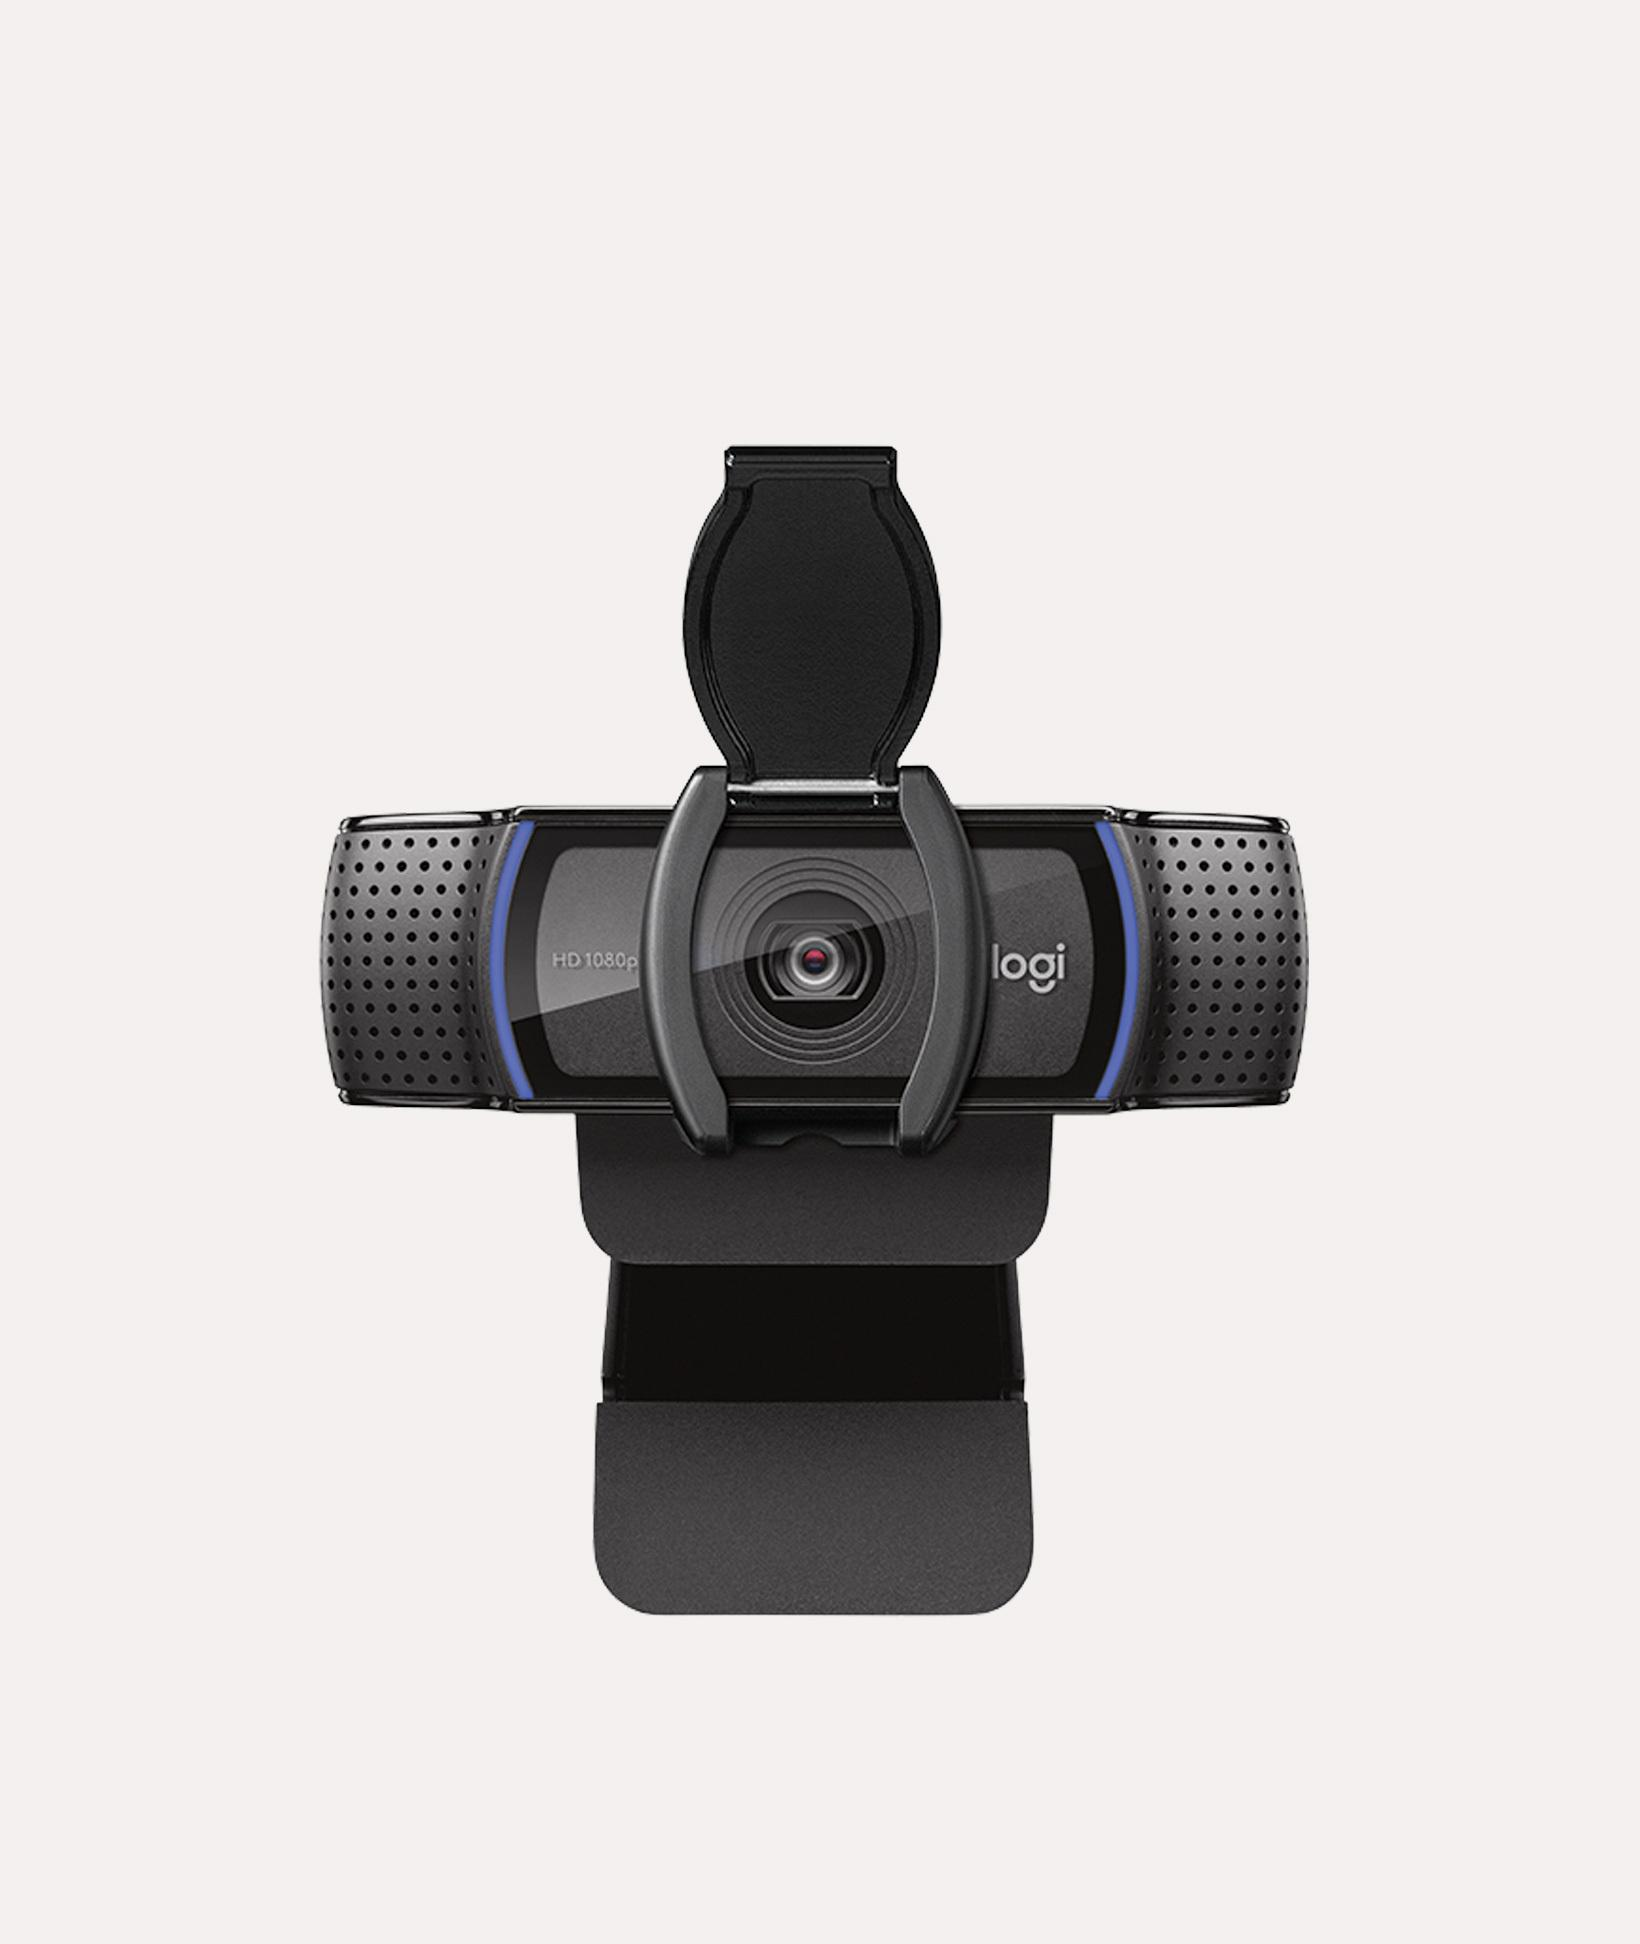 De Logitech C920 HD Pro Webcam voor Windows, Mac en Chrome OS | 1944x1640